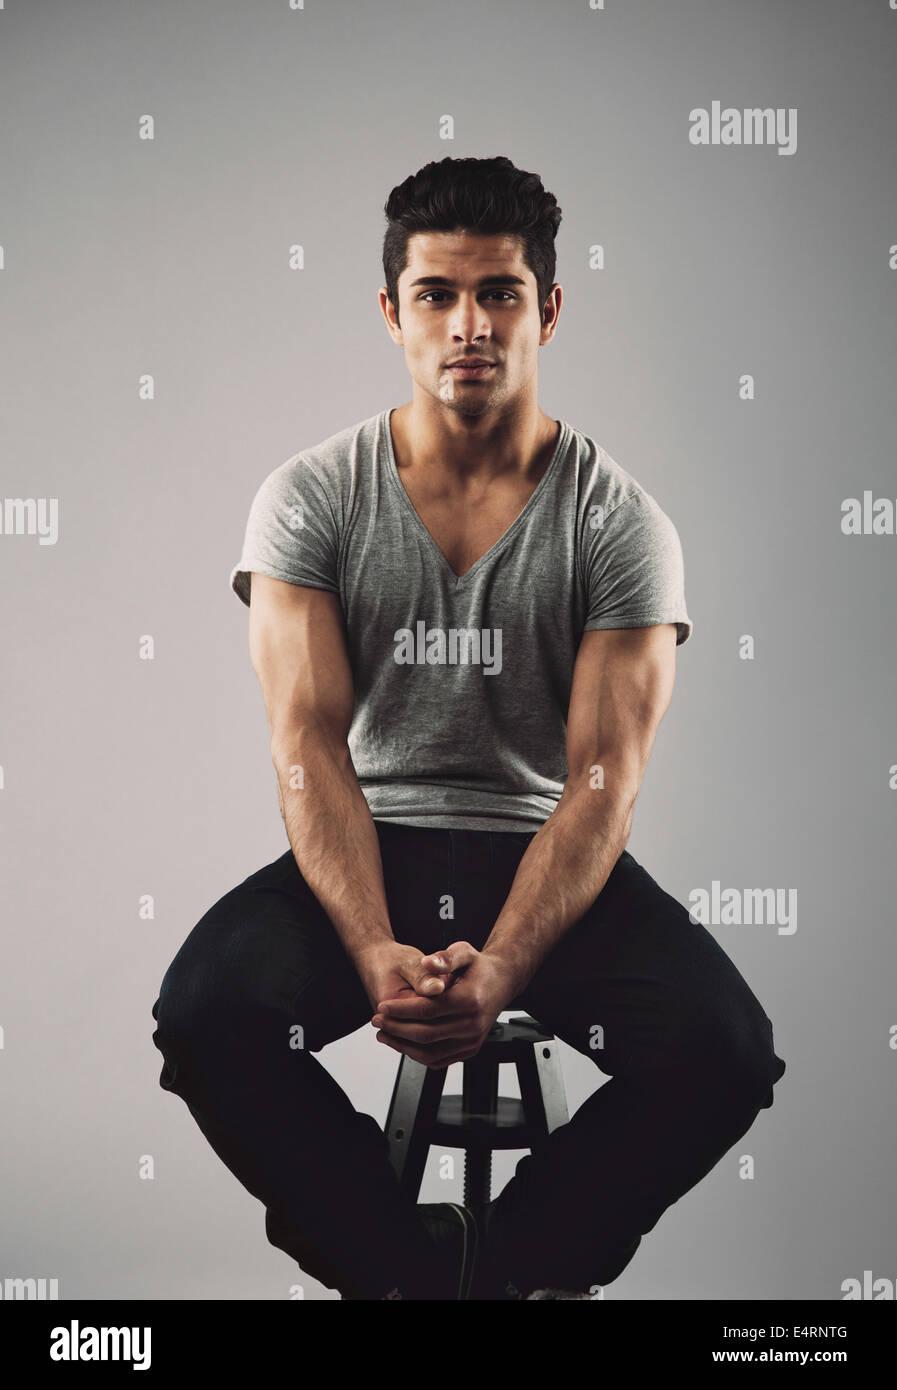 Retrato del joven muscular modelo masculino sentado en heces. Joven hispana sobre fondo gris. Imagen De Stock